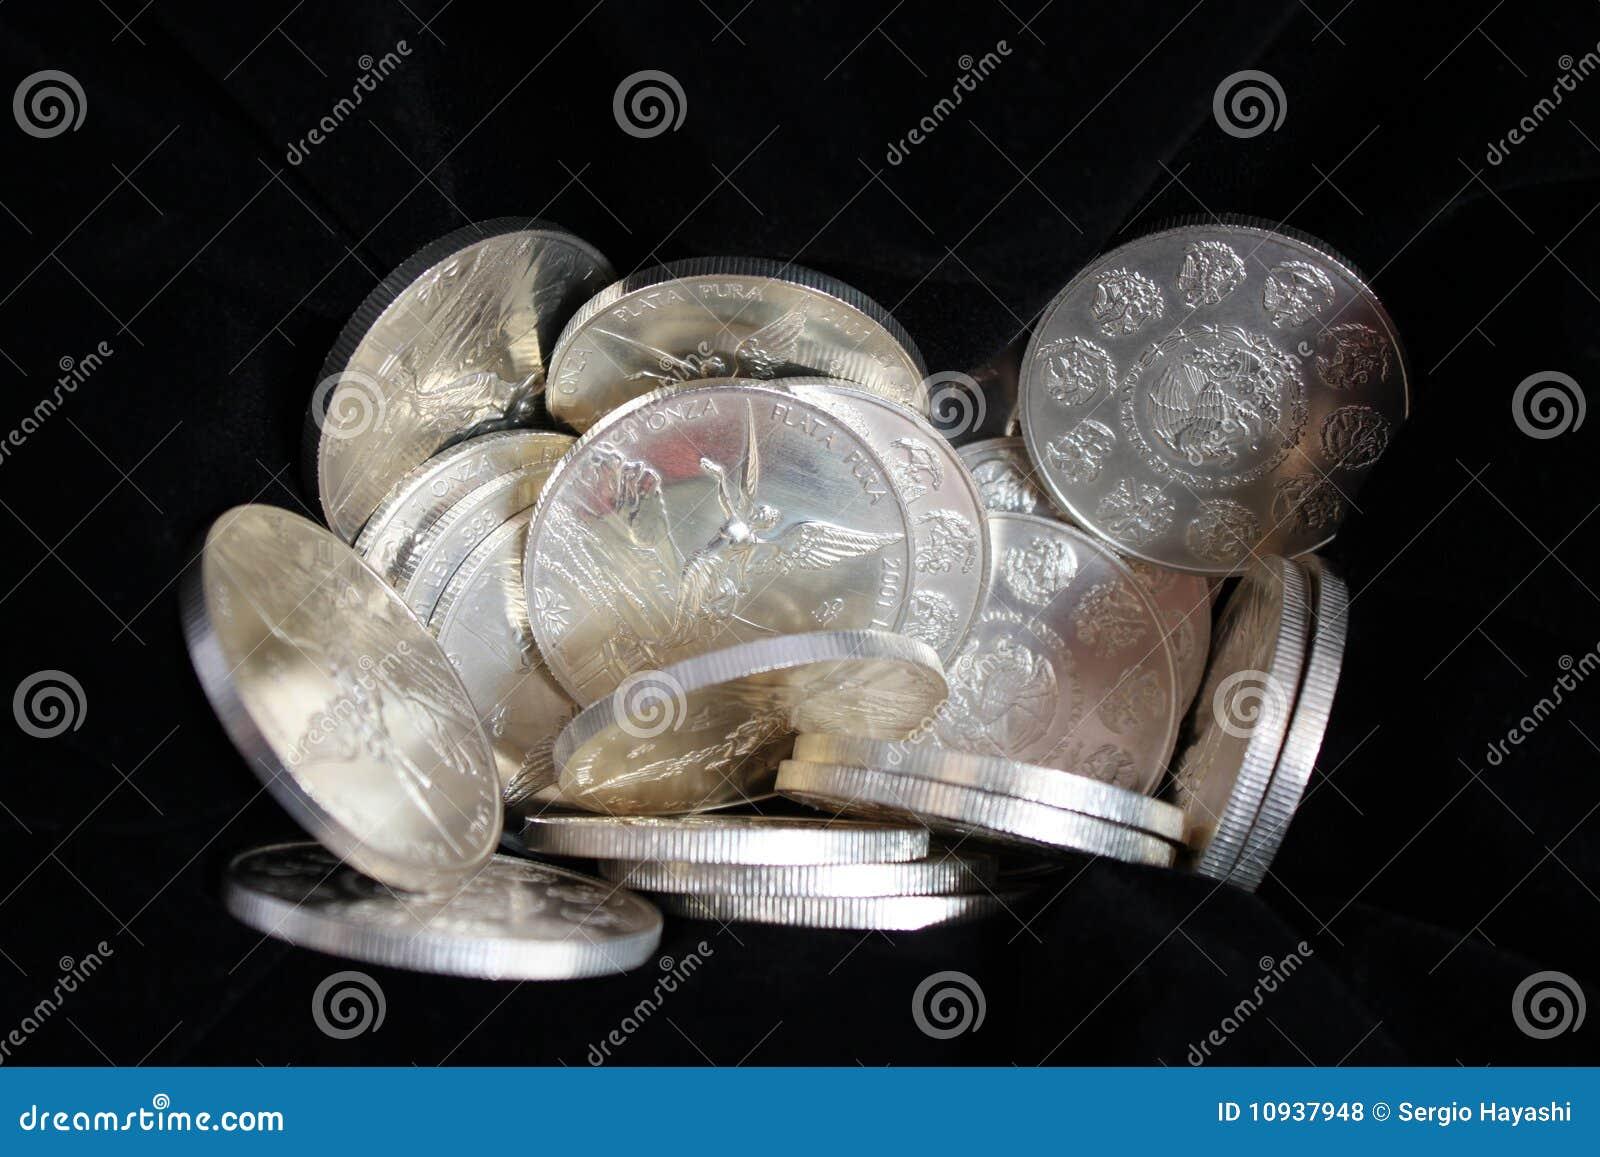 мексиканский чисто серебр 999